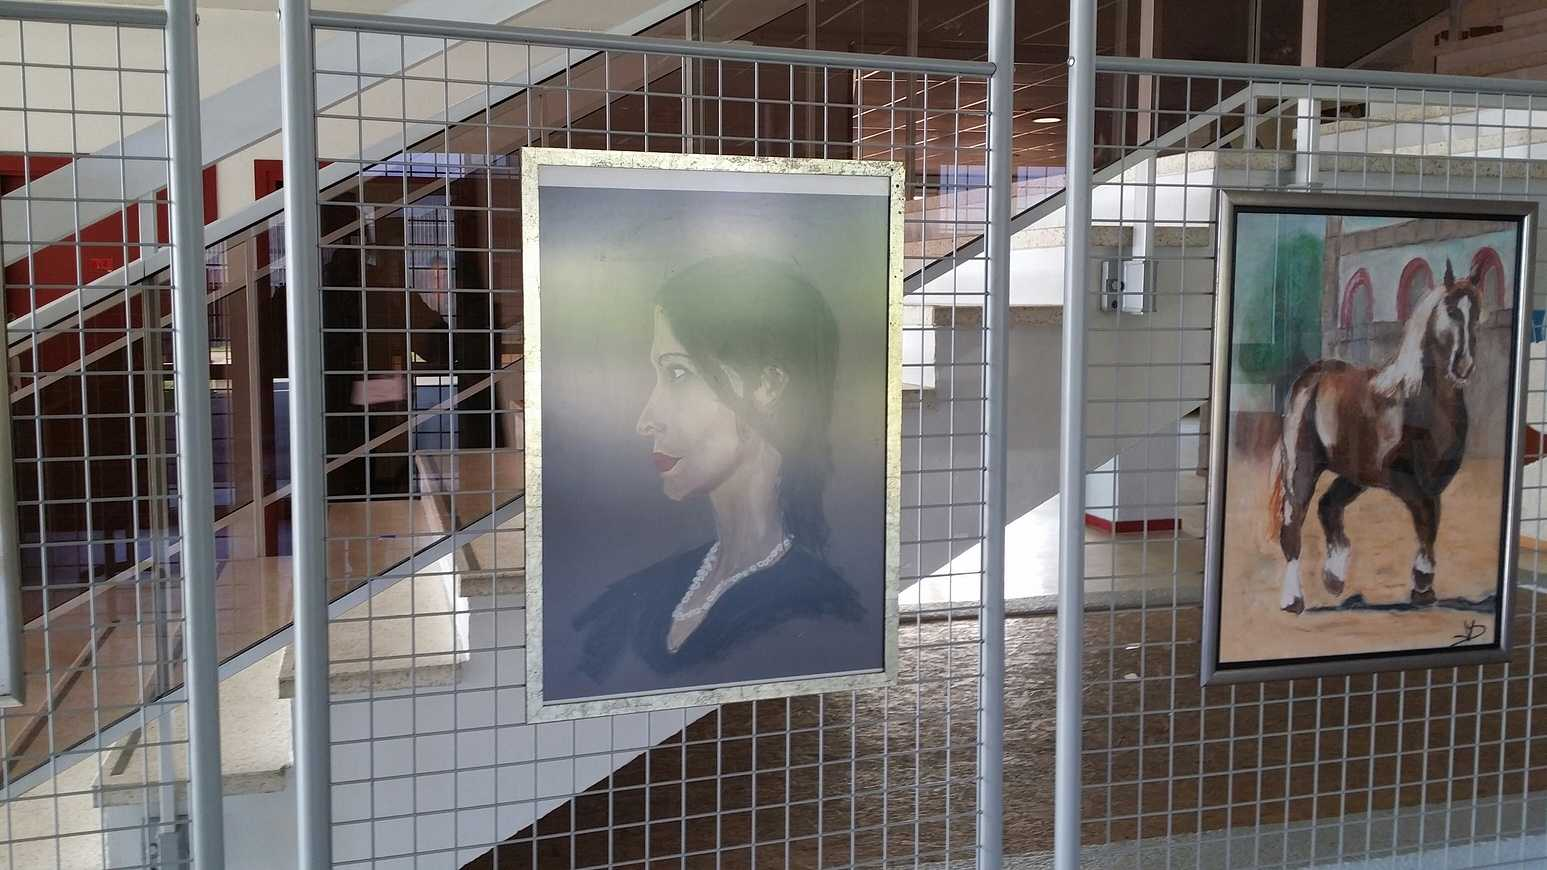 Jean-Yves Derrien expose dans l''Agora 20150407101641resized